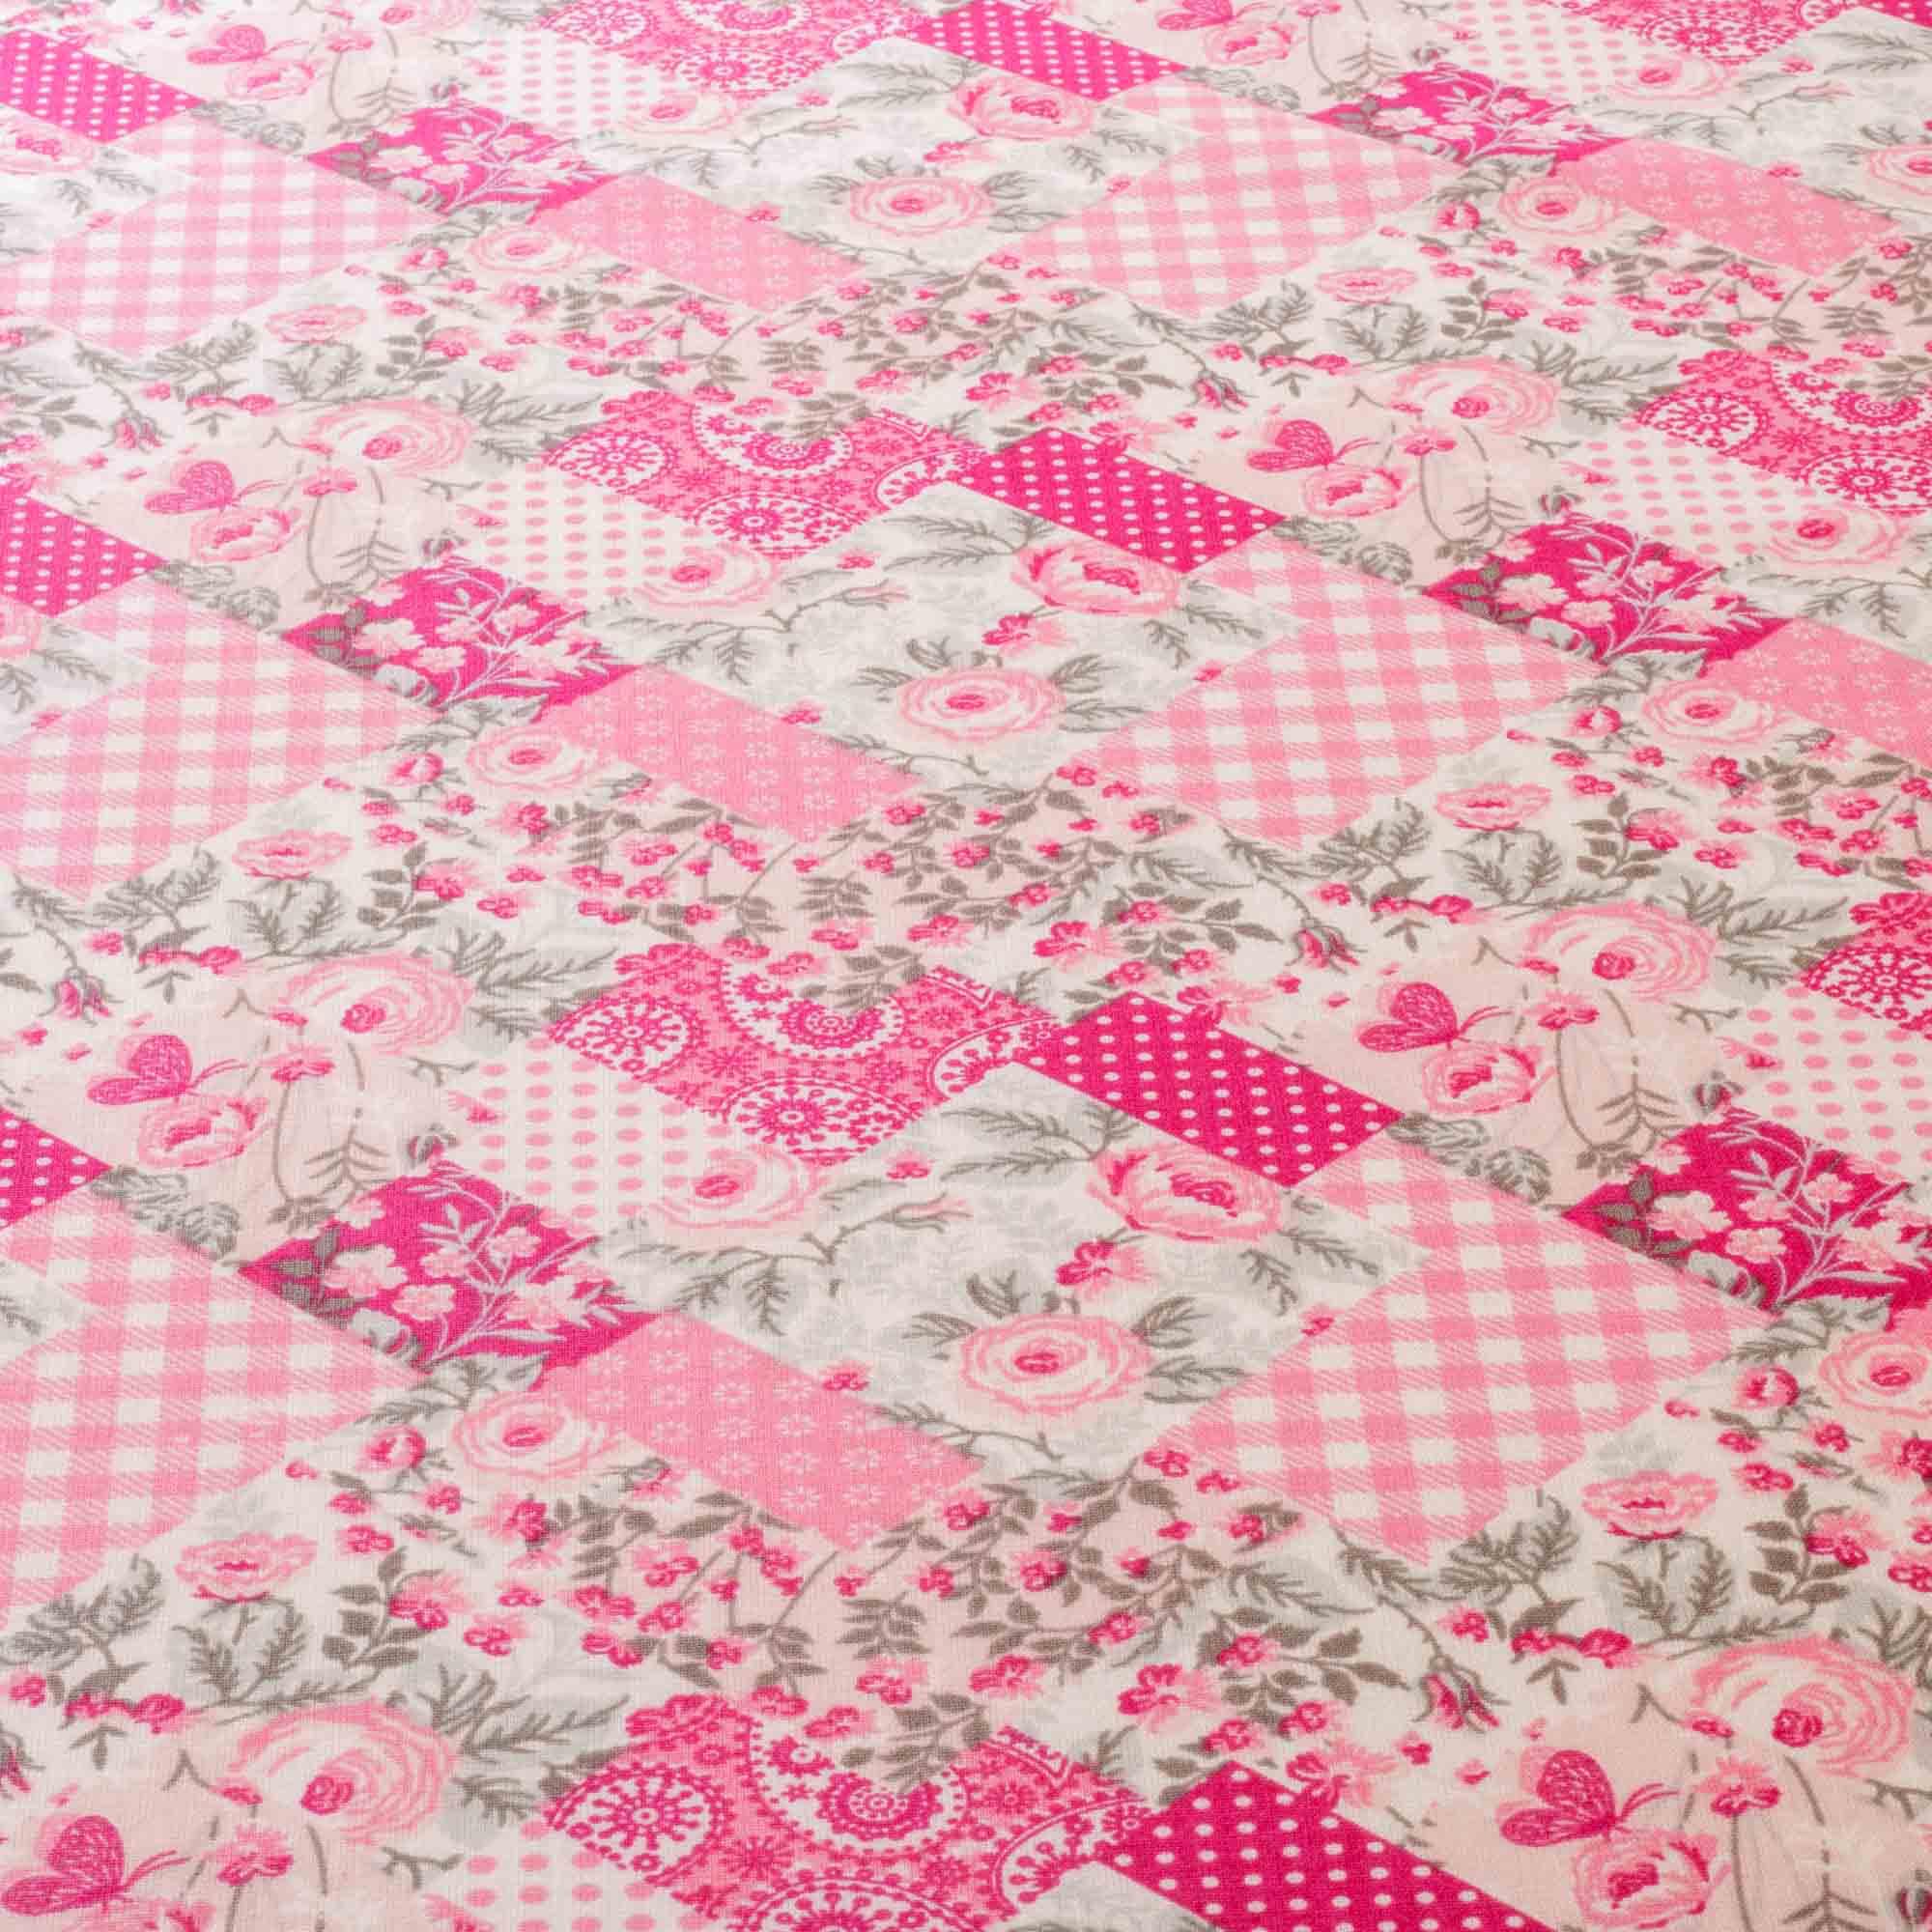 Tecido Tricoline Estampado Floral 1,40 Mt Largura Rosa